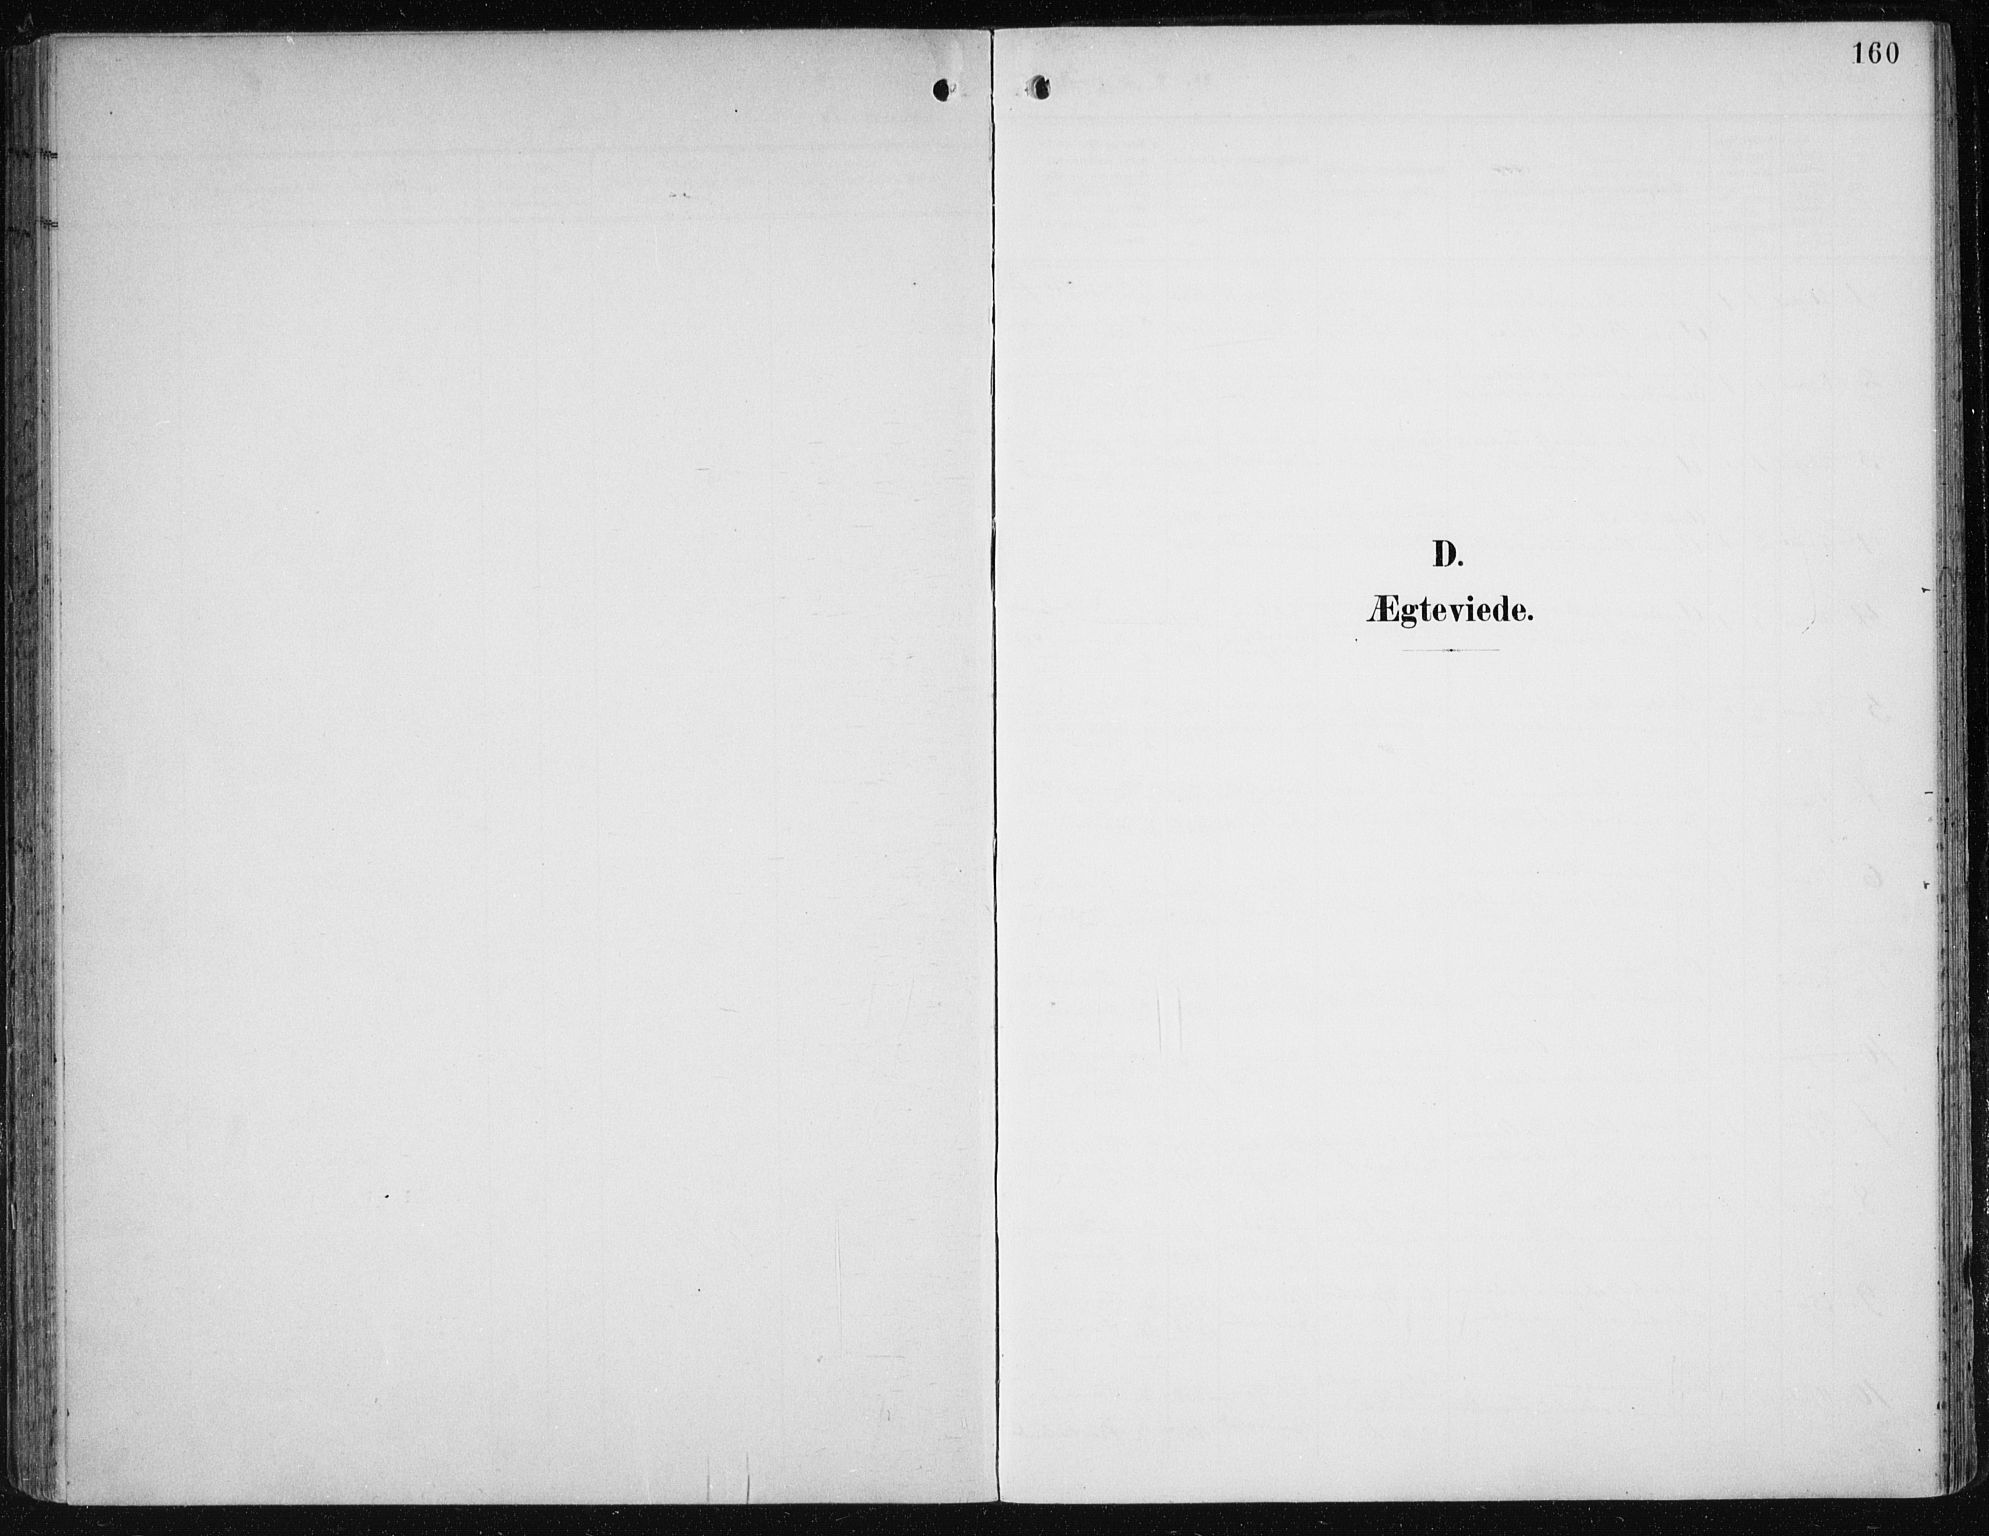 SAB, Birkeland Sokneprestembete, H/Haa: Parish register (official) no. A 3, 1900-1912, p. 160